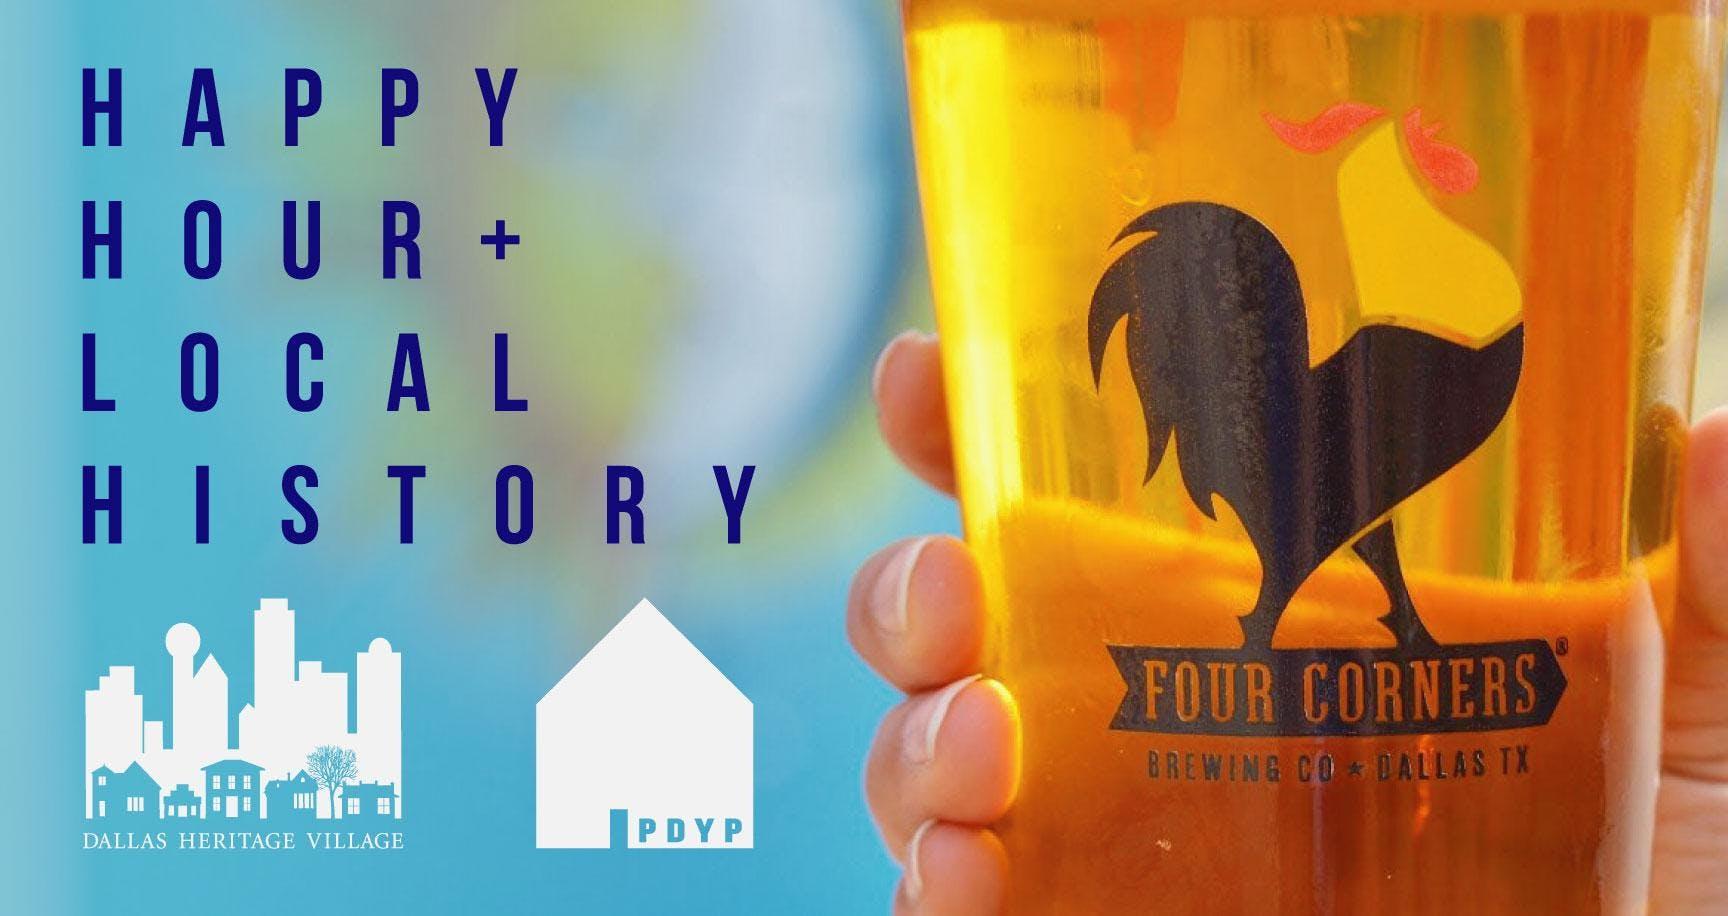 PDYP Happy Hour: Four Corners Brewery